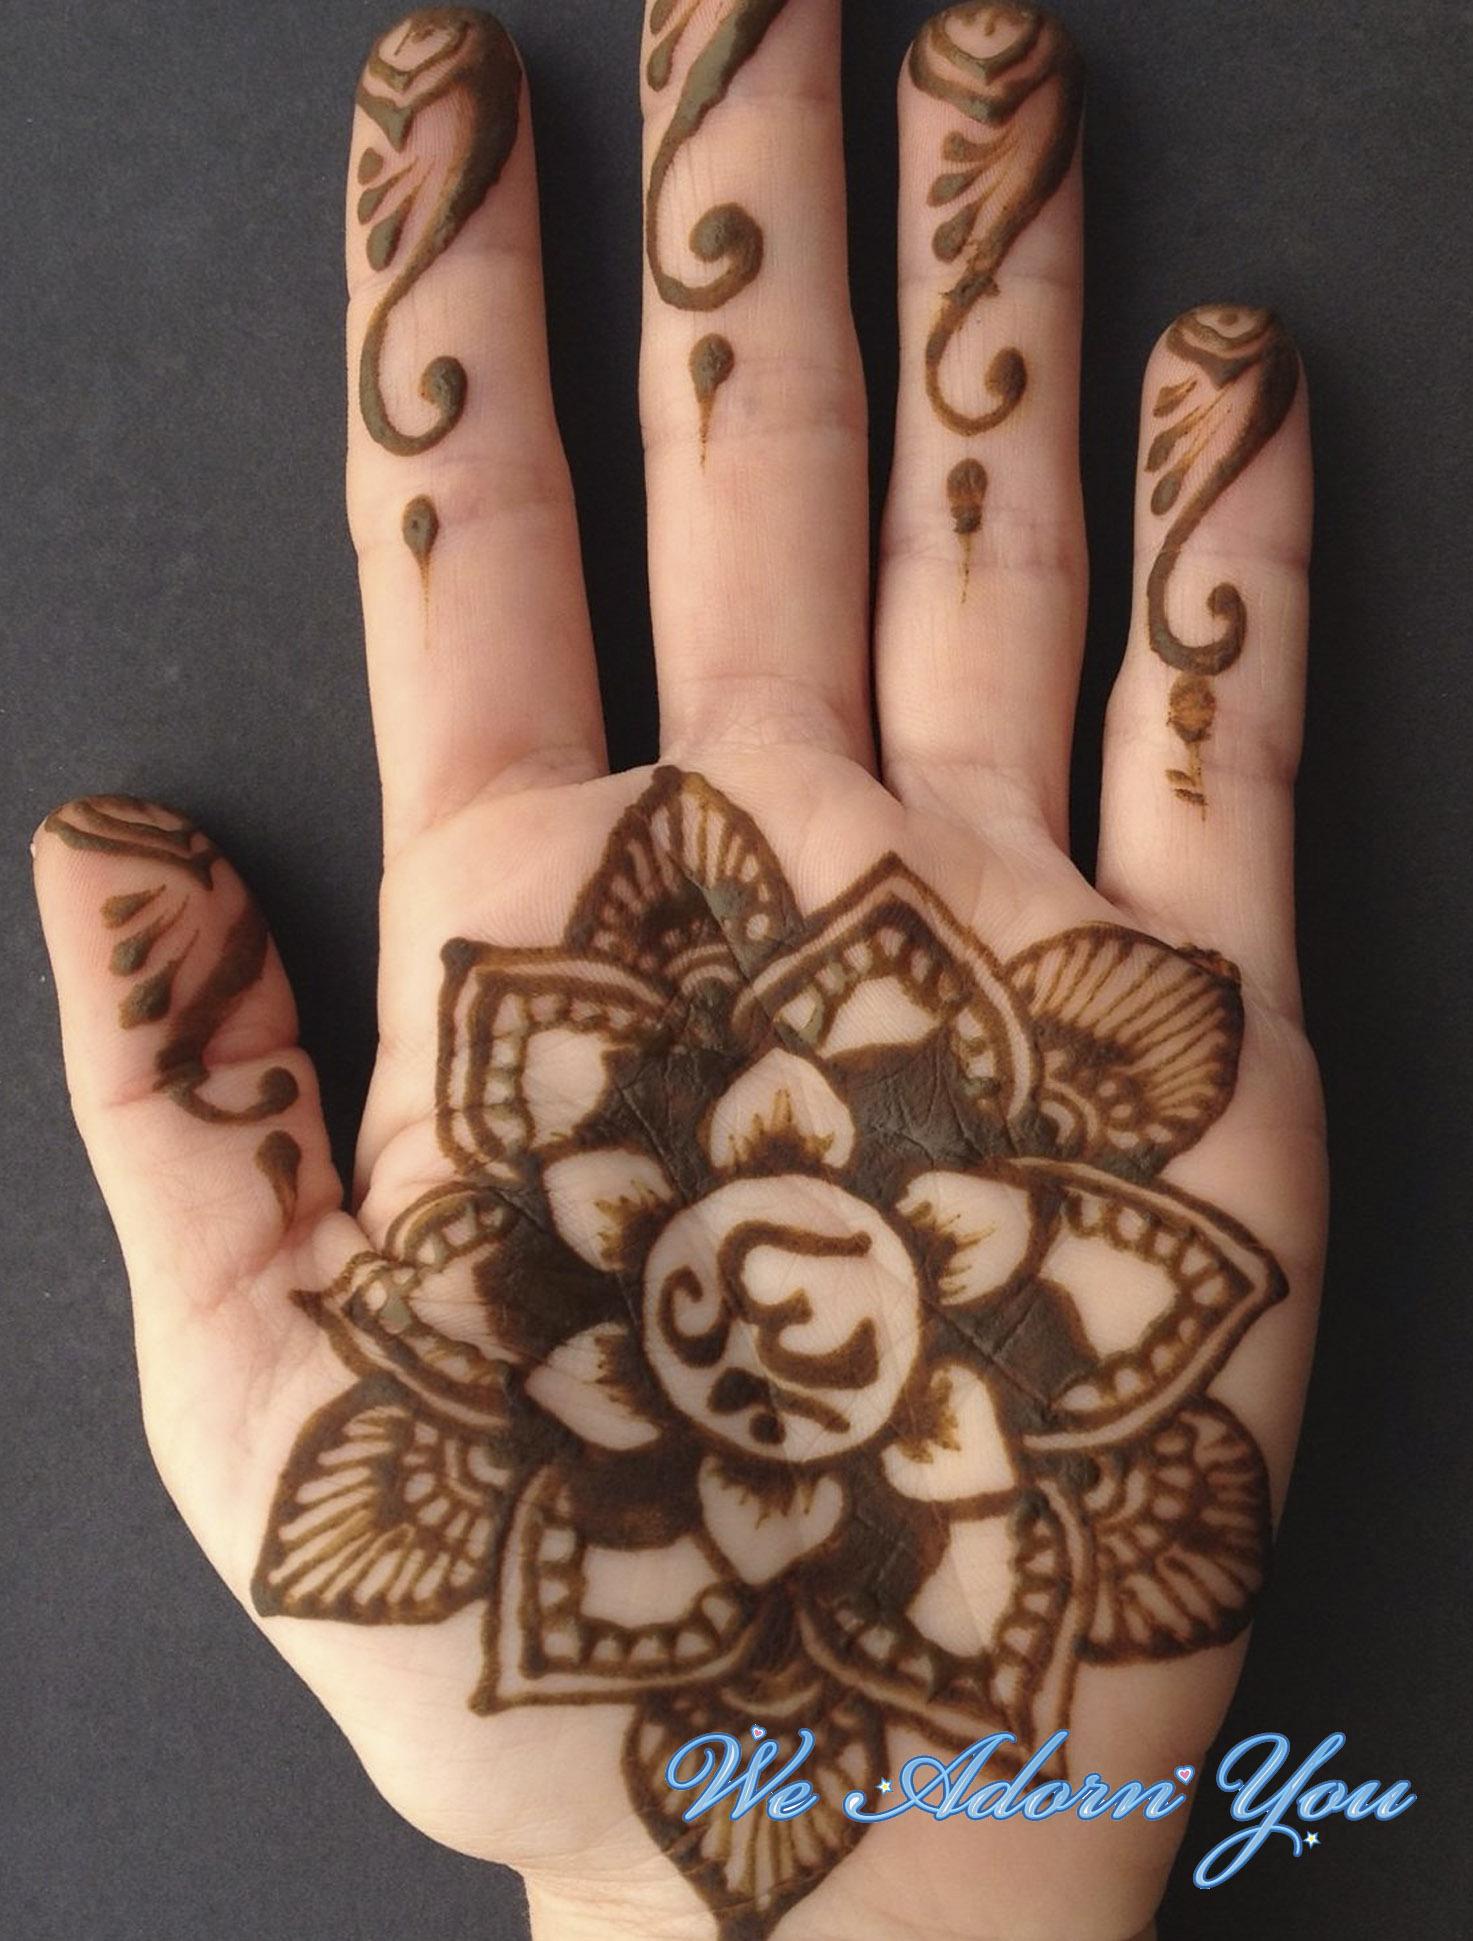 Henna Ohm - We Adorn You.jpg